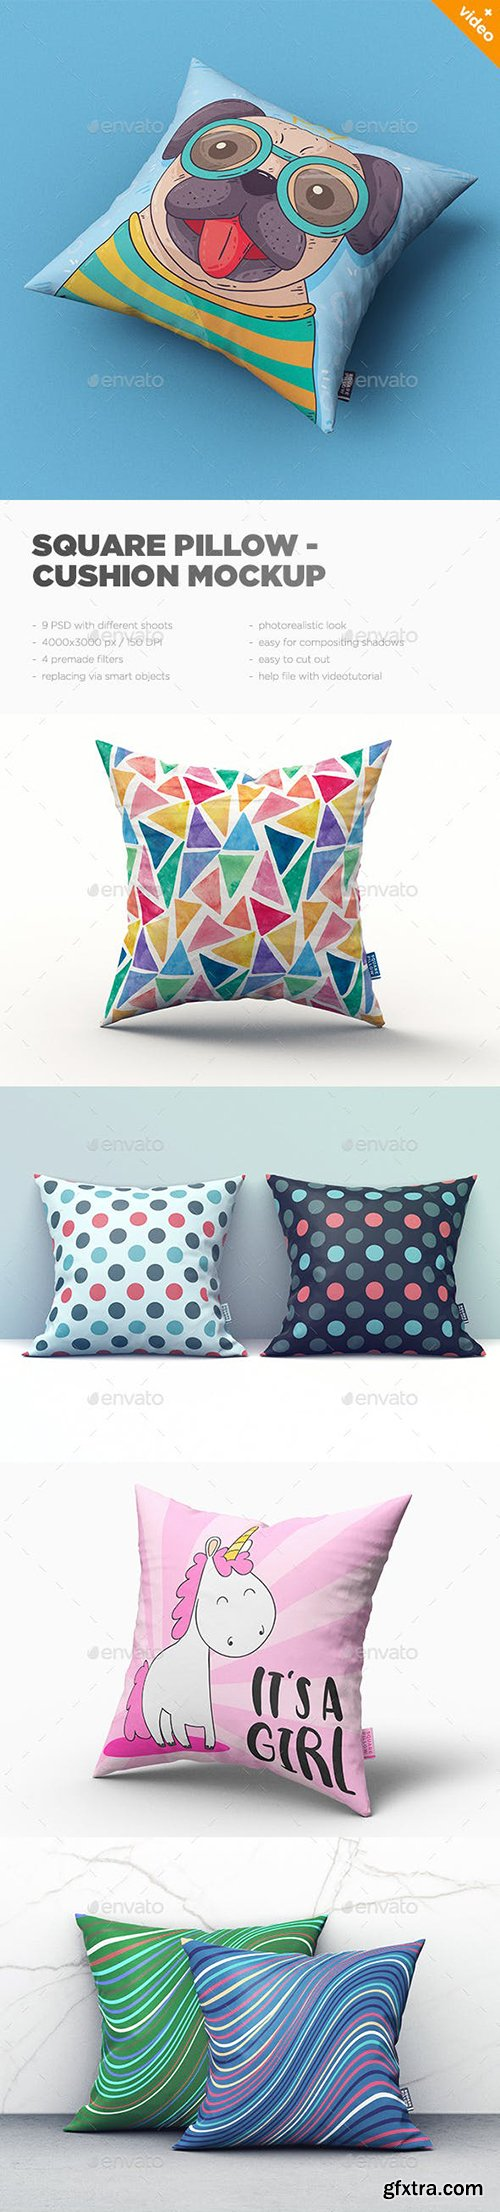 Graphicriver - Square Pillow / Cushion MockUp 22996798